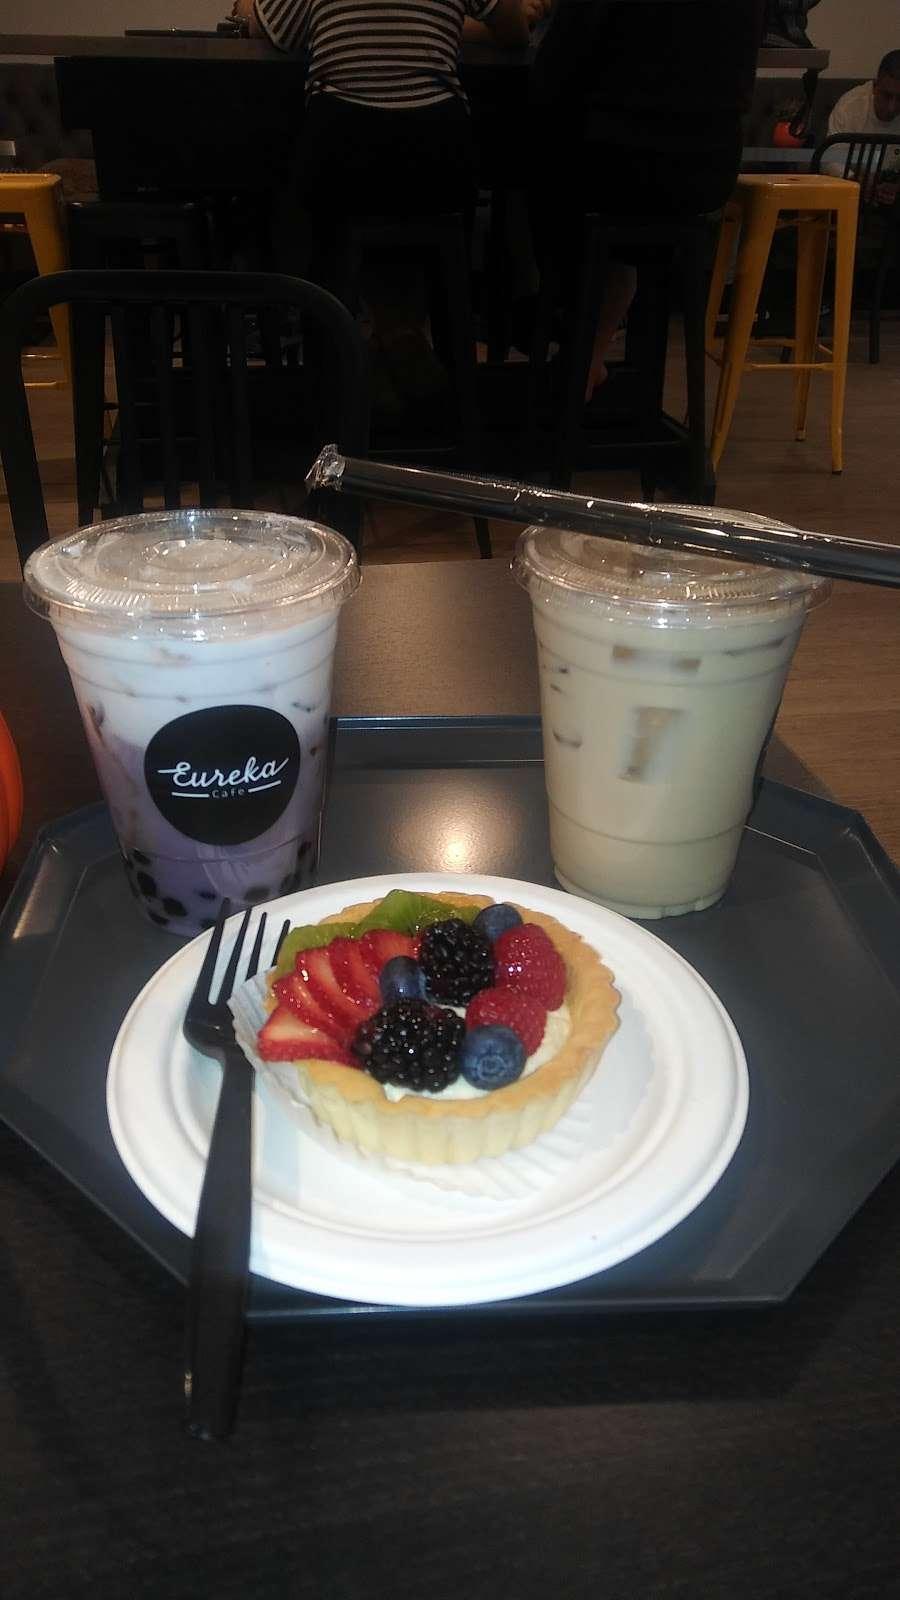 Yureka Cafe - cafe  | Photo 10 of 10 | Address: 401 E Foothill Blvd, Azusa, CA 91702, USA